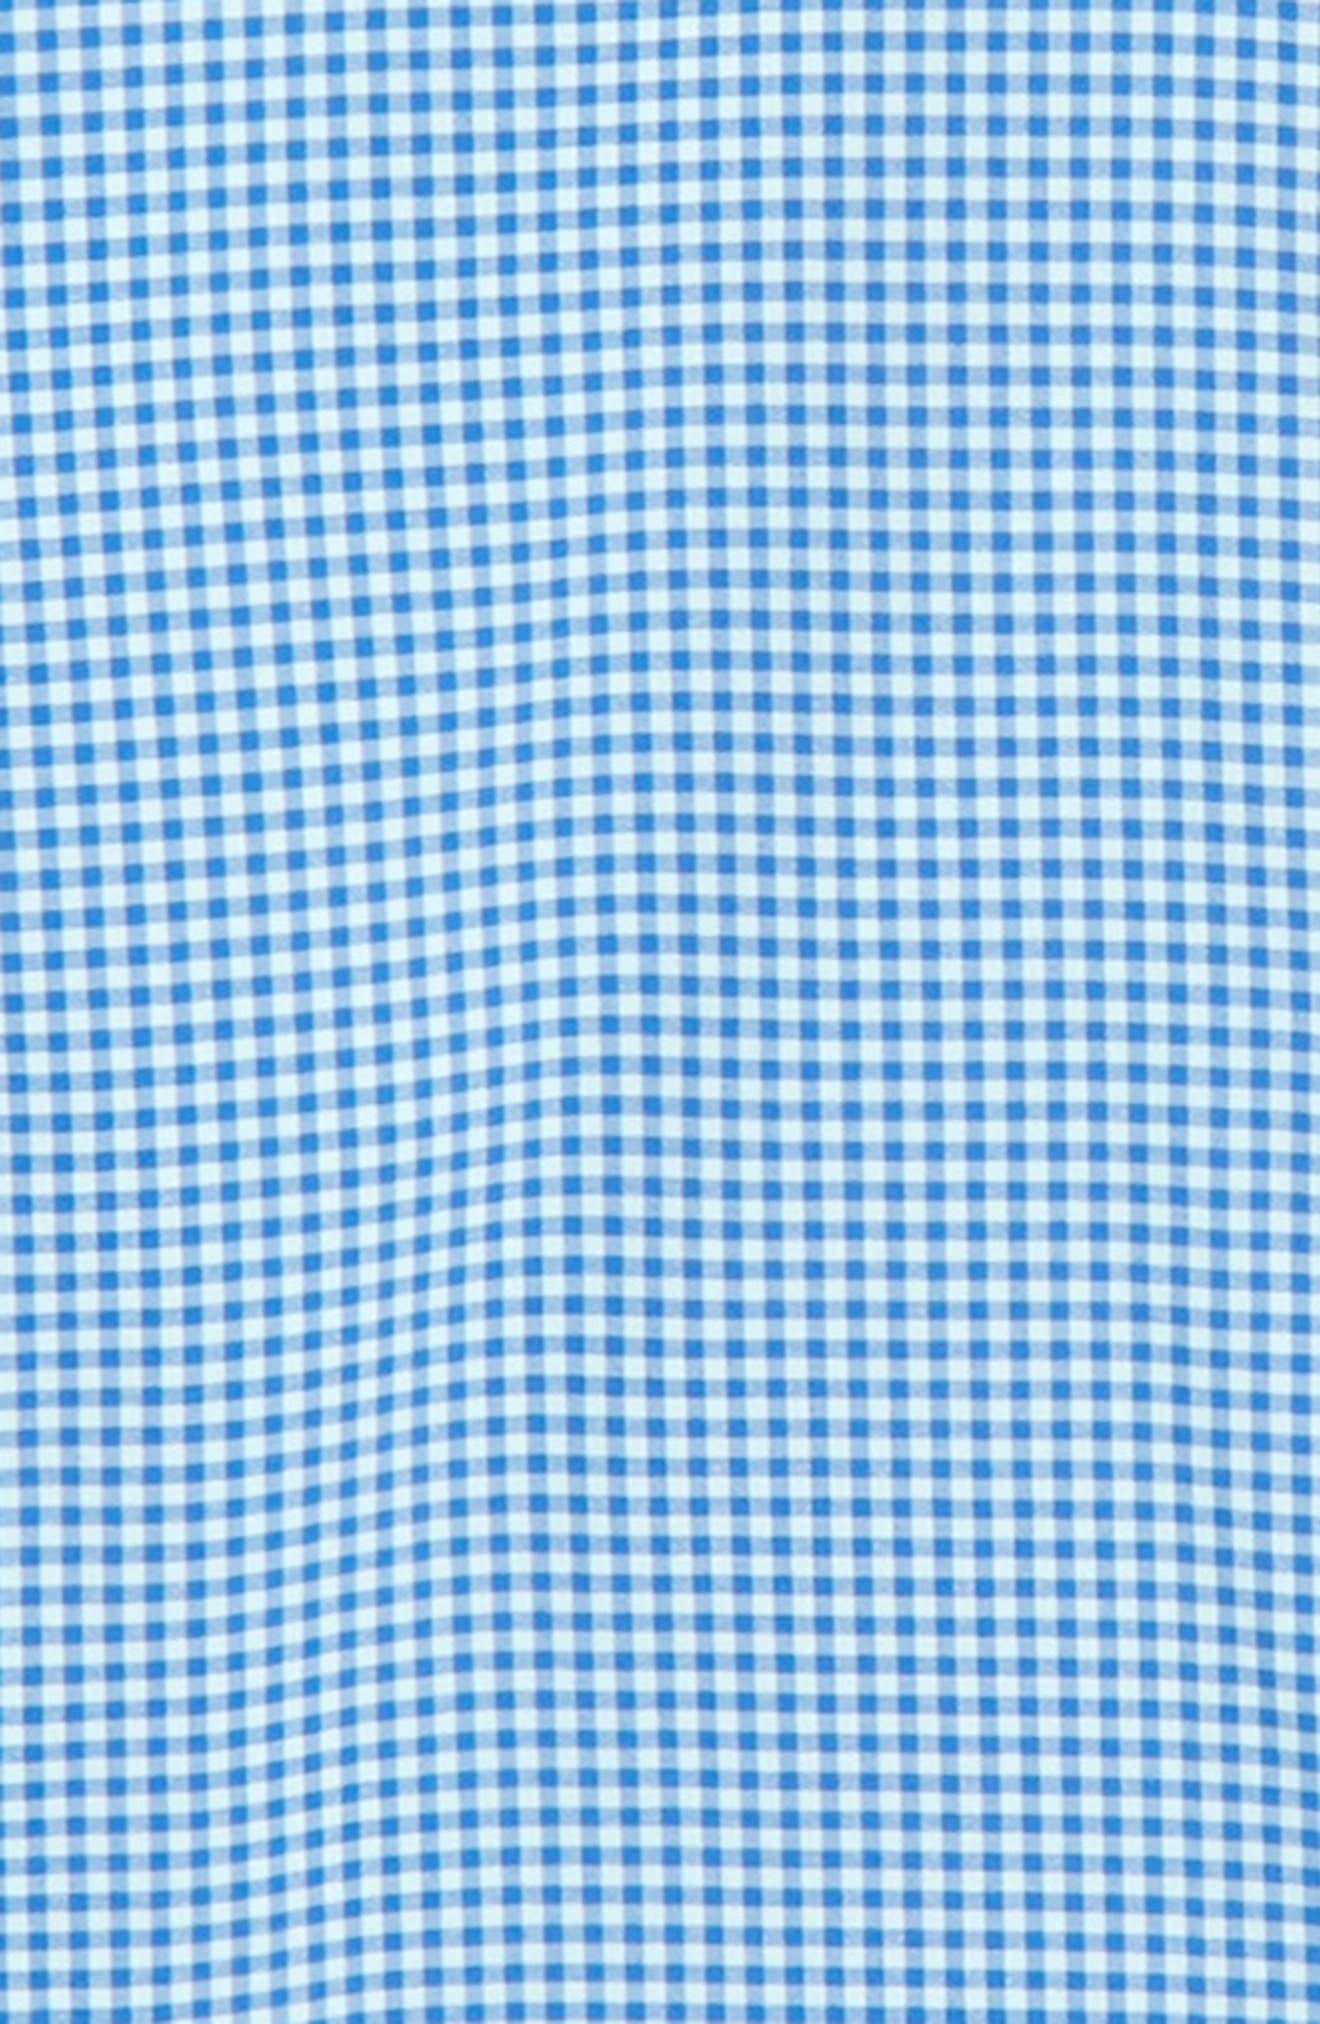 Marina Gingham Check Whale Shirt,                             Alternate thumbnail 2, color,                             451